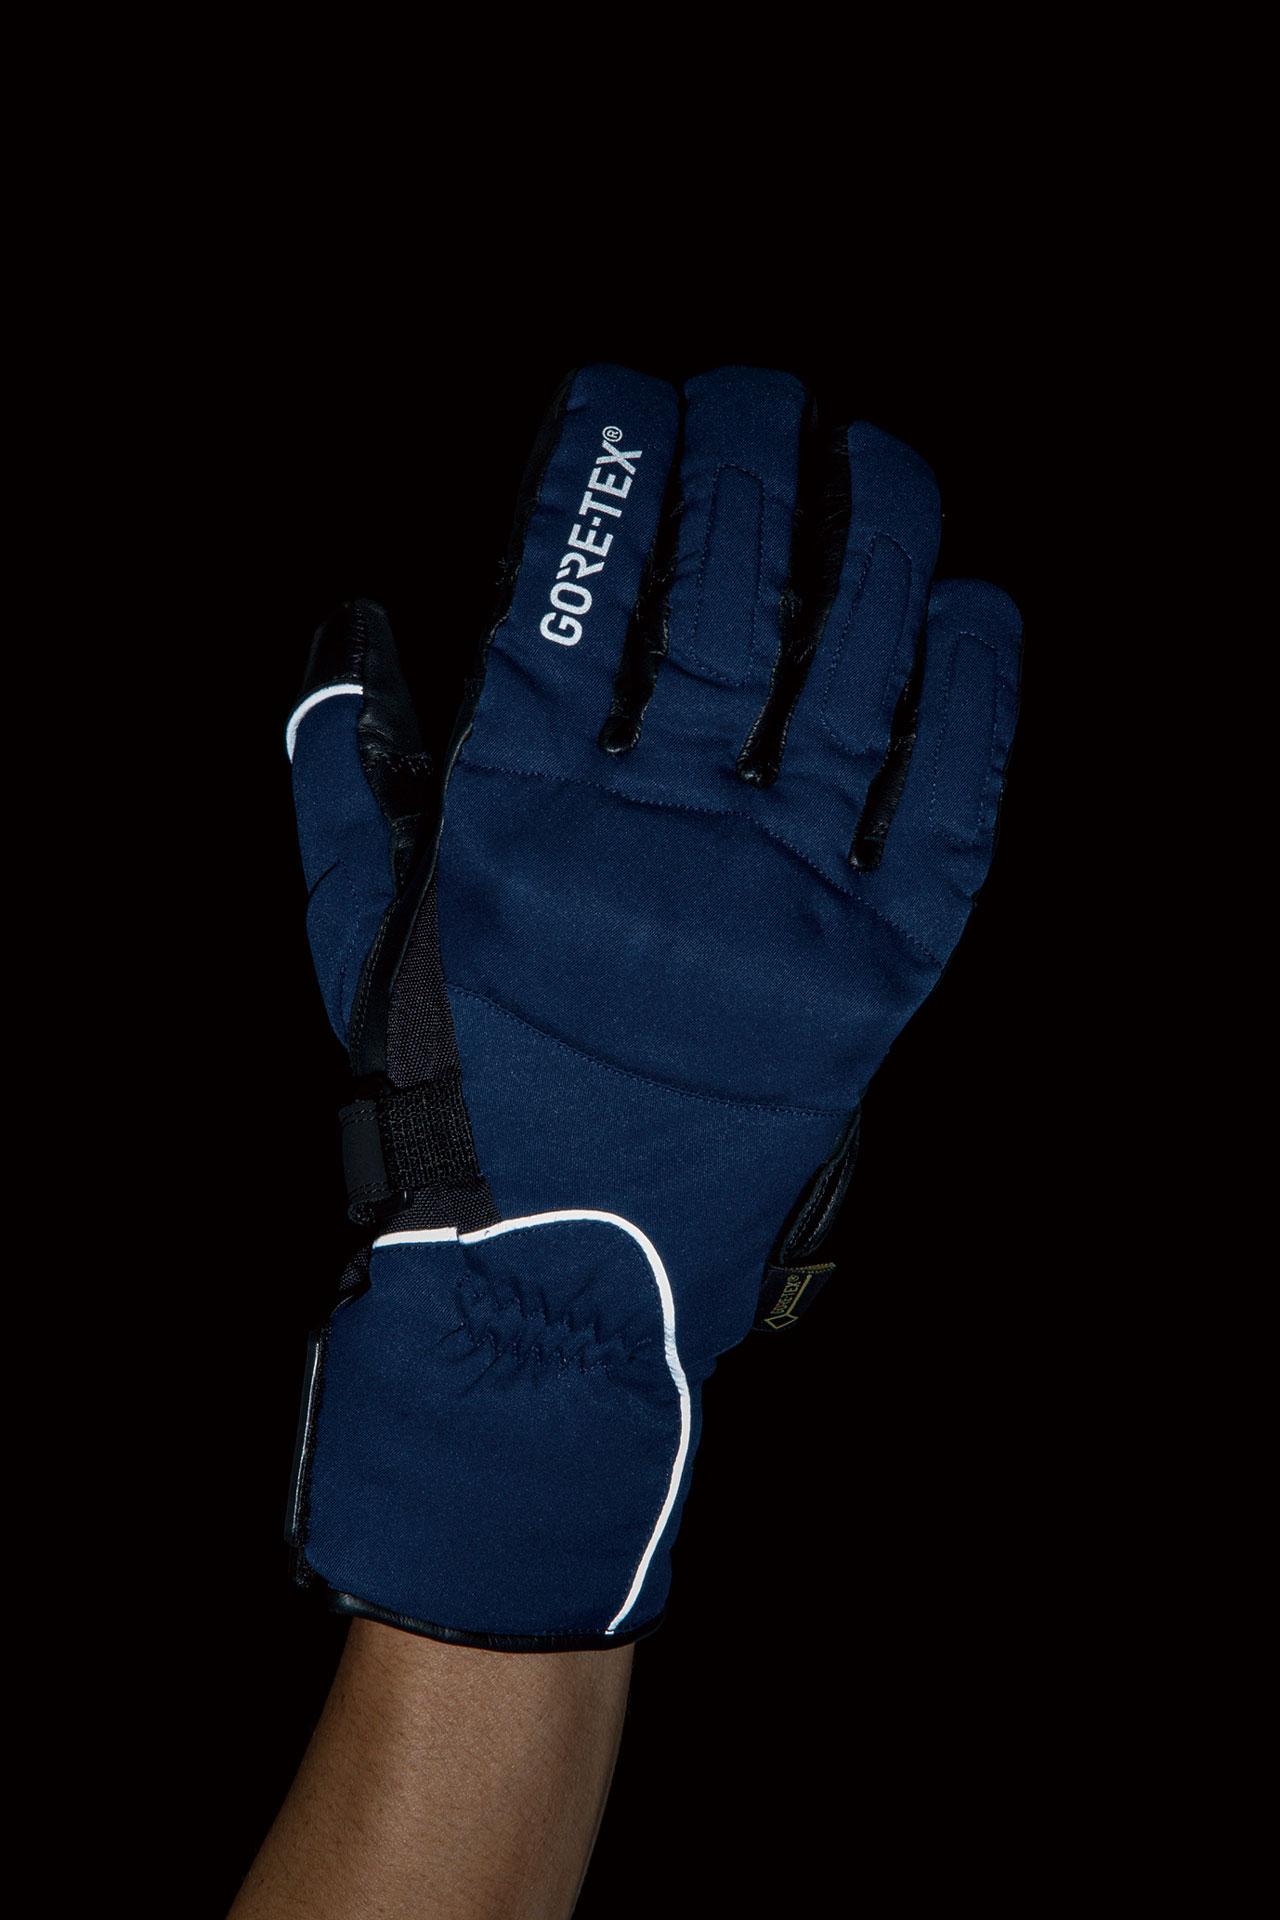 【HONDA RIDING GEAR】GORE-TEX防護手套 - 「Webike-摩托百貨」